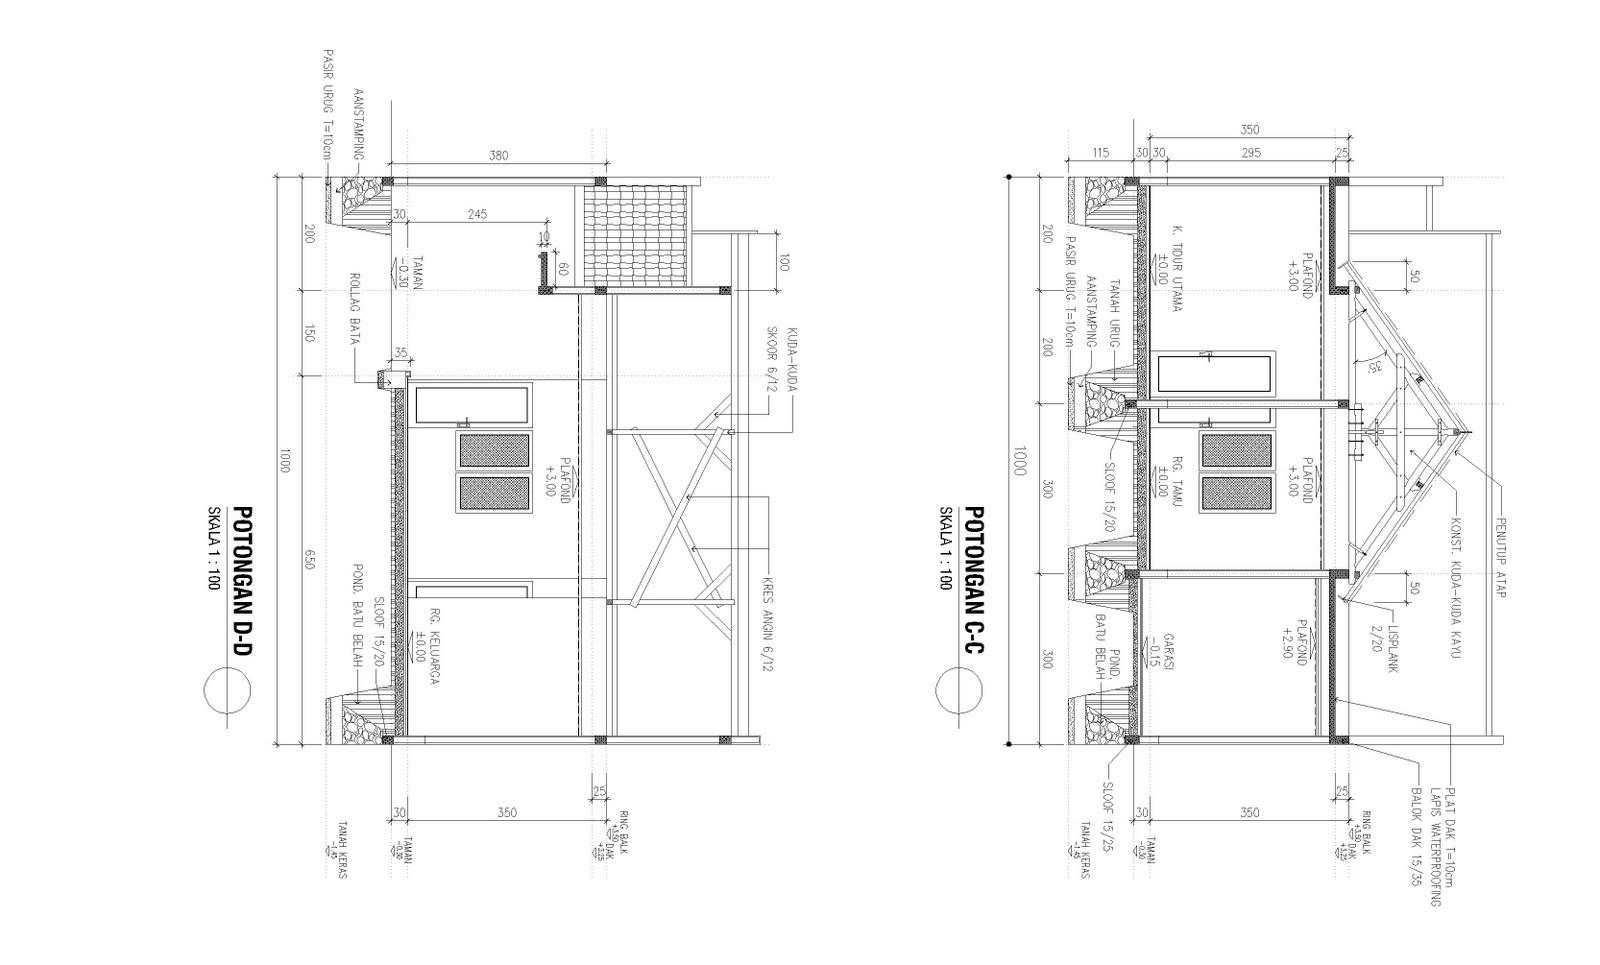 Manual Leica Ts02